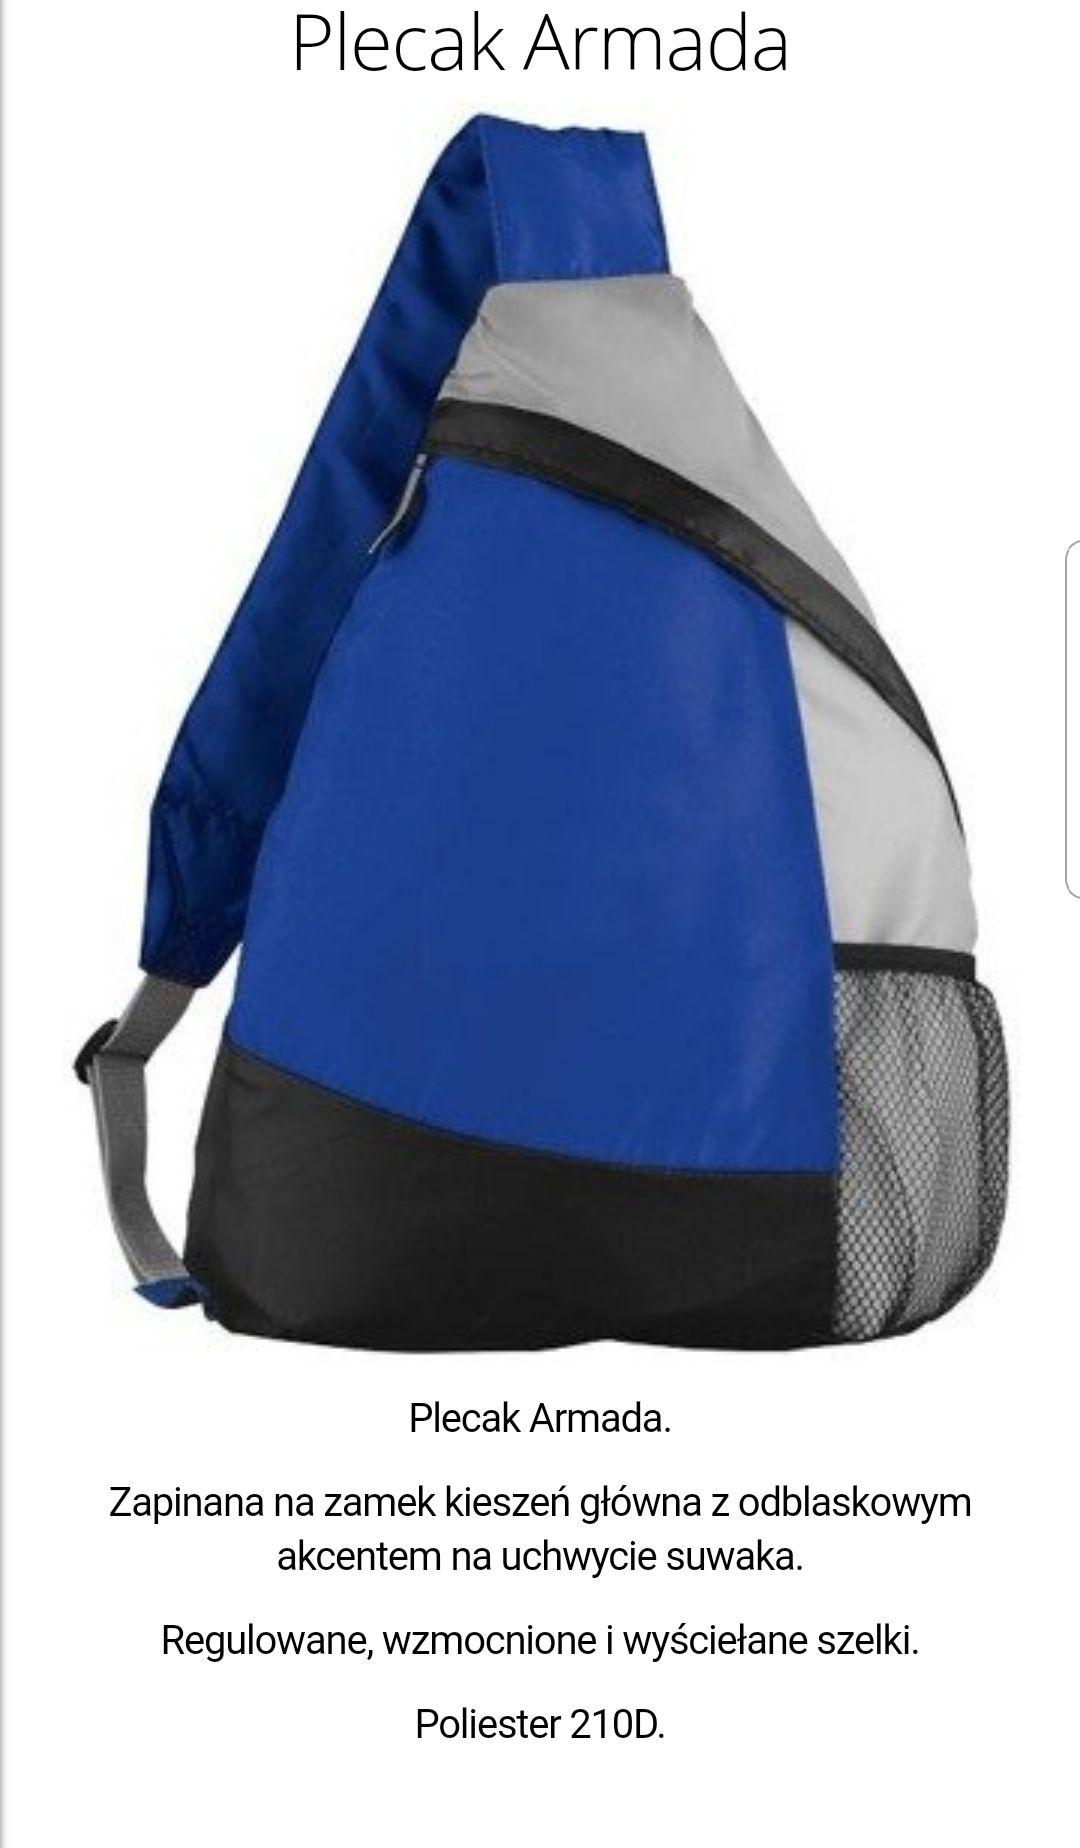 Plecak Armada za 0.33zł